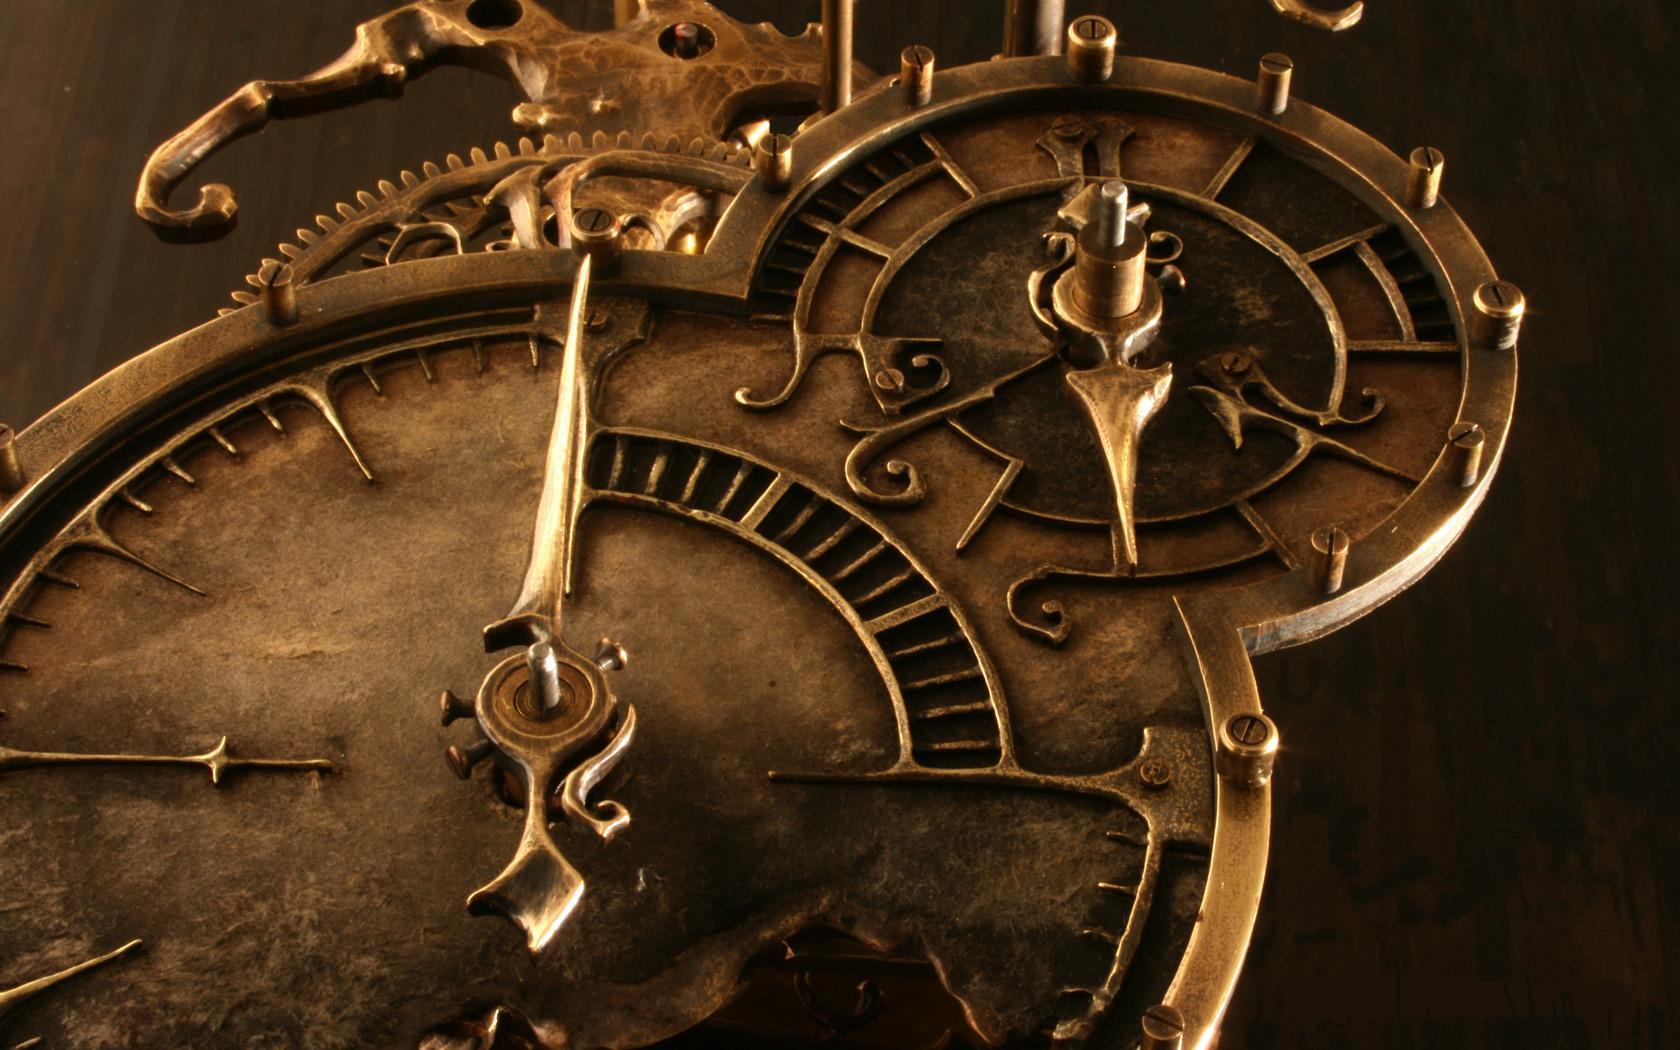 Steampunk mechanical clock watch bokeh e wallpaper 1680x1050 62180 1680x1050